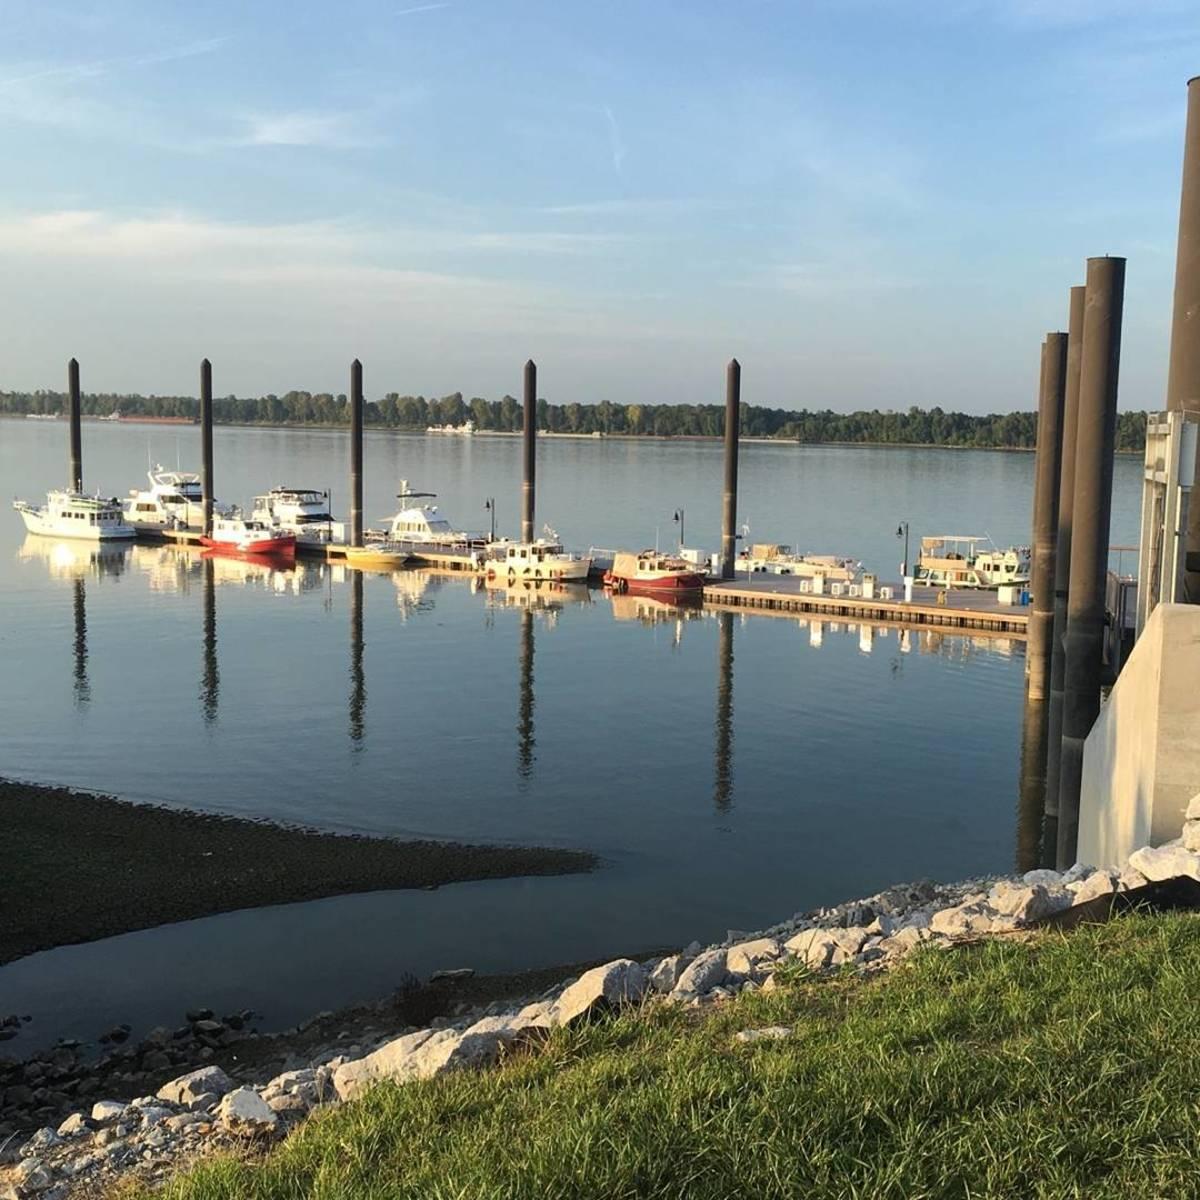 Paducah, Kentucky transient dock